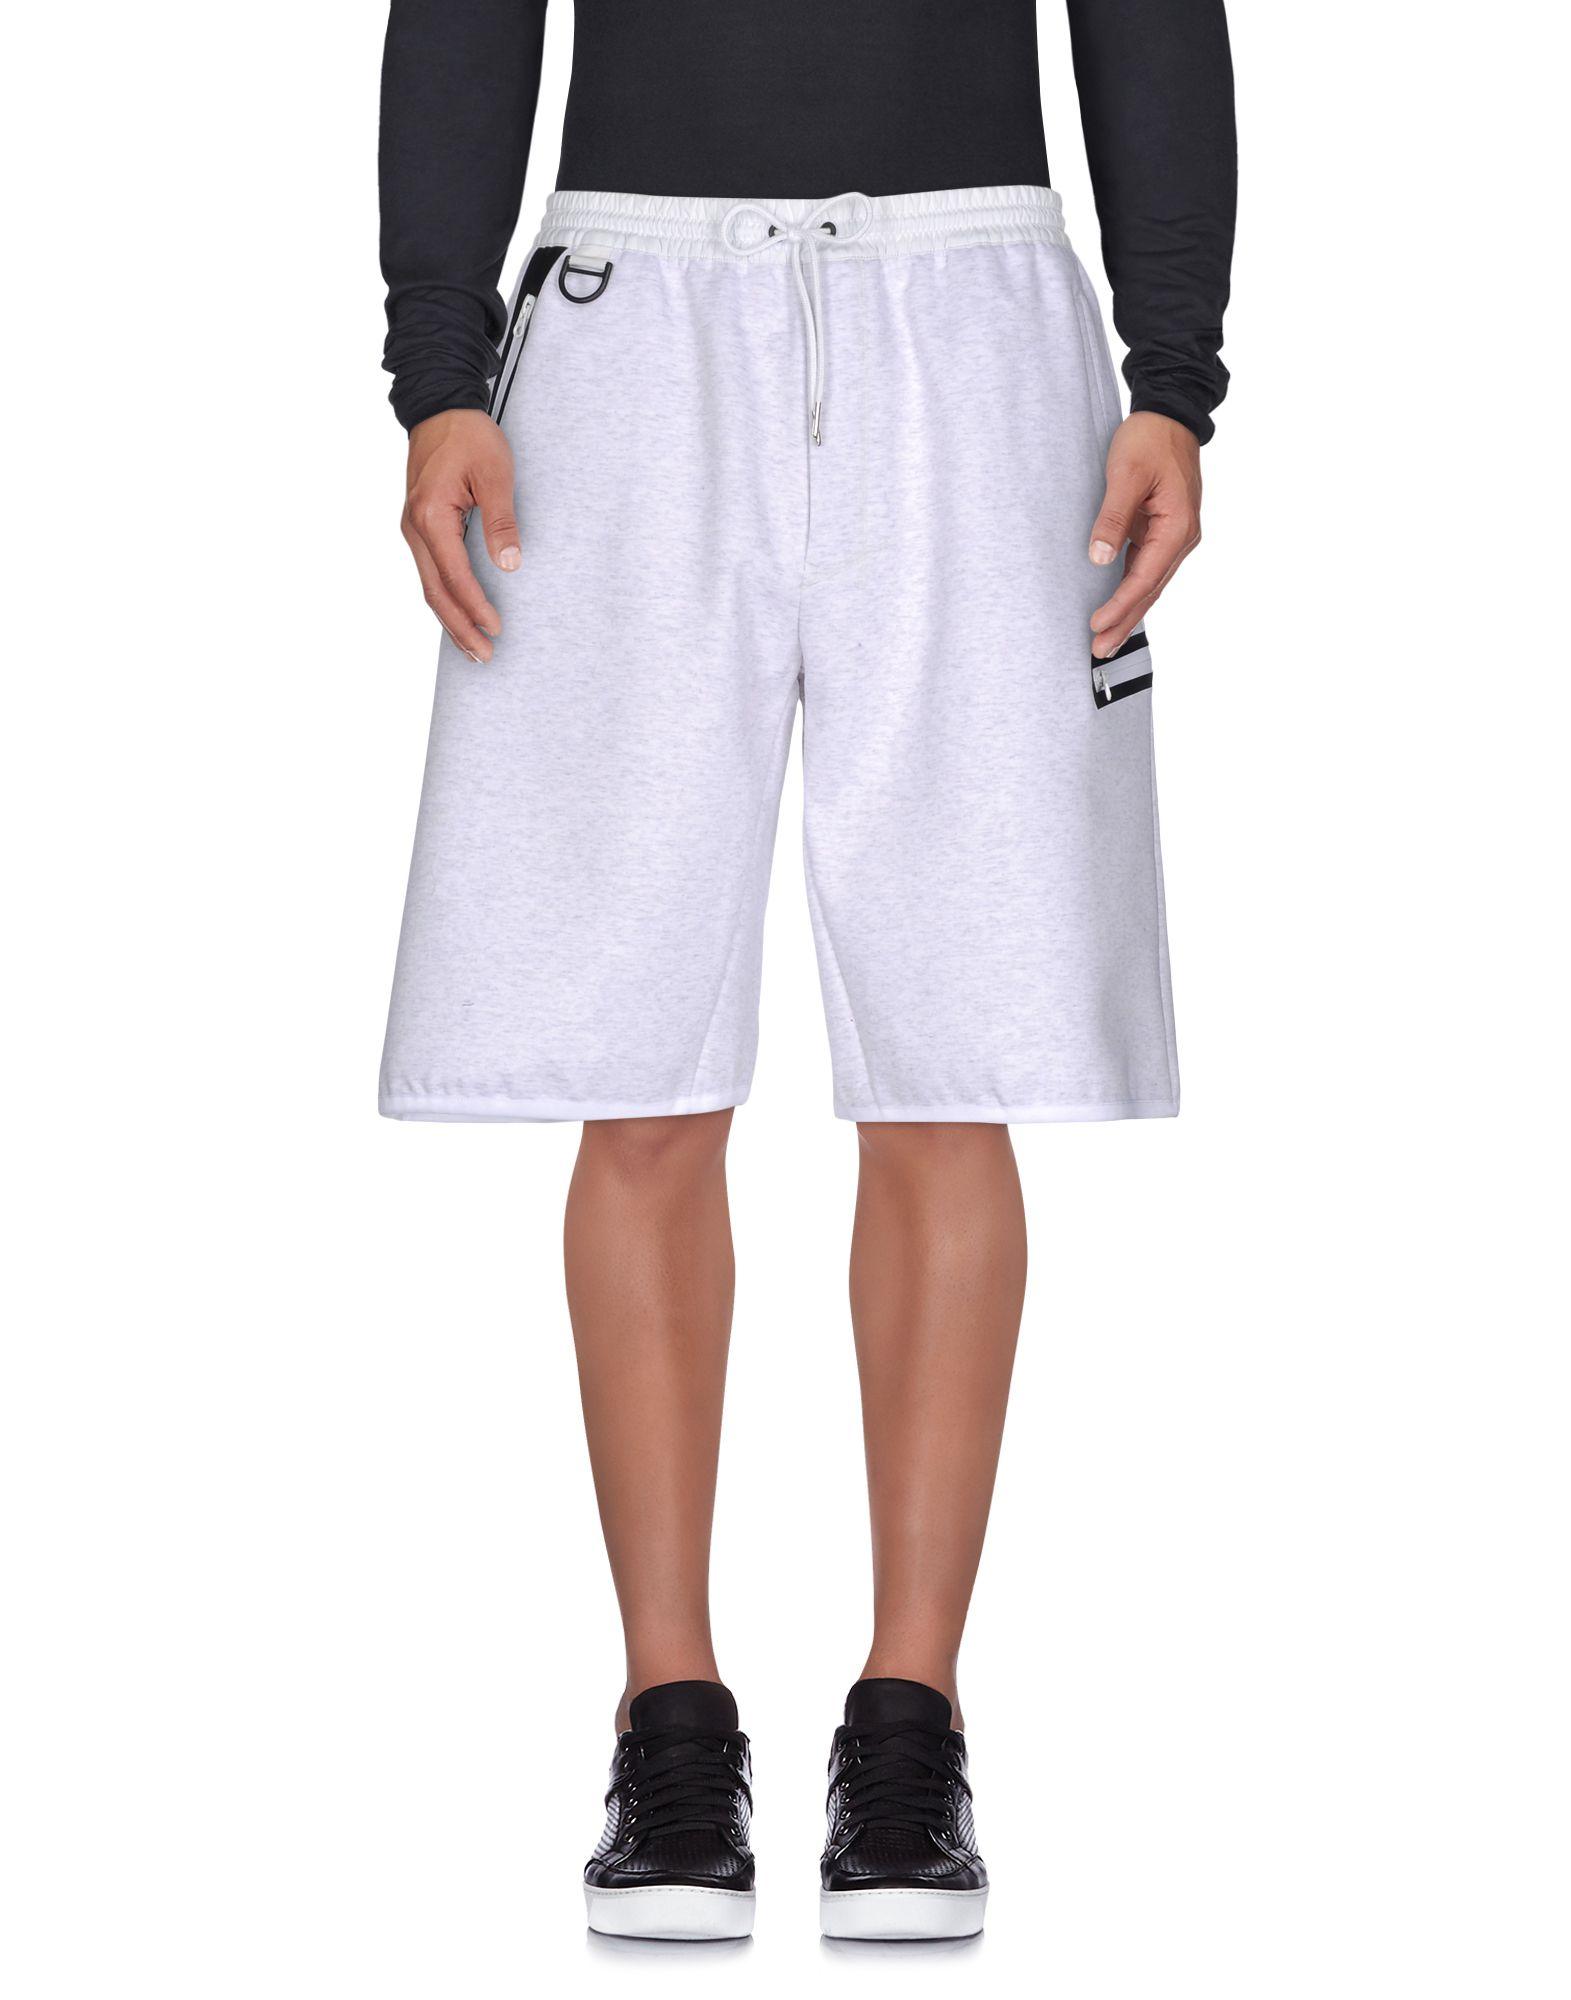 Pantalone Y-3 Felpa Y-3 Pantalone Uomo - 13002331VK e622d6